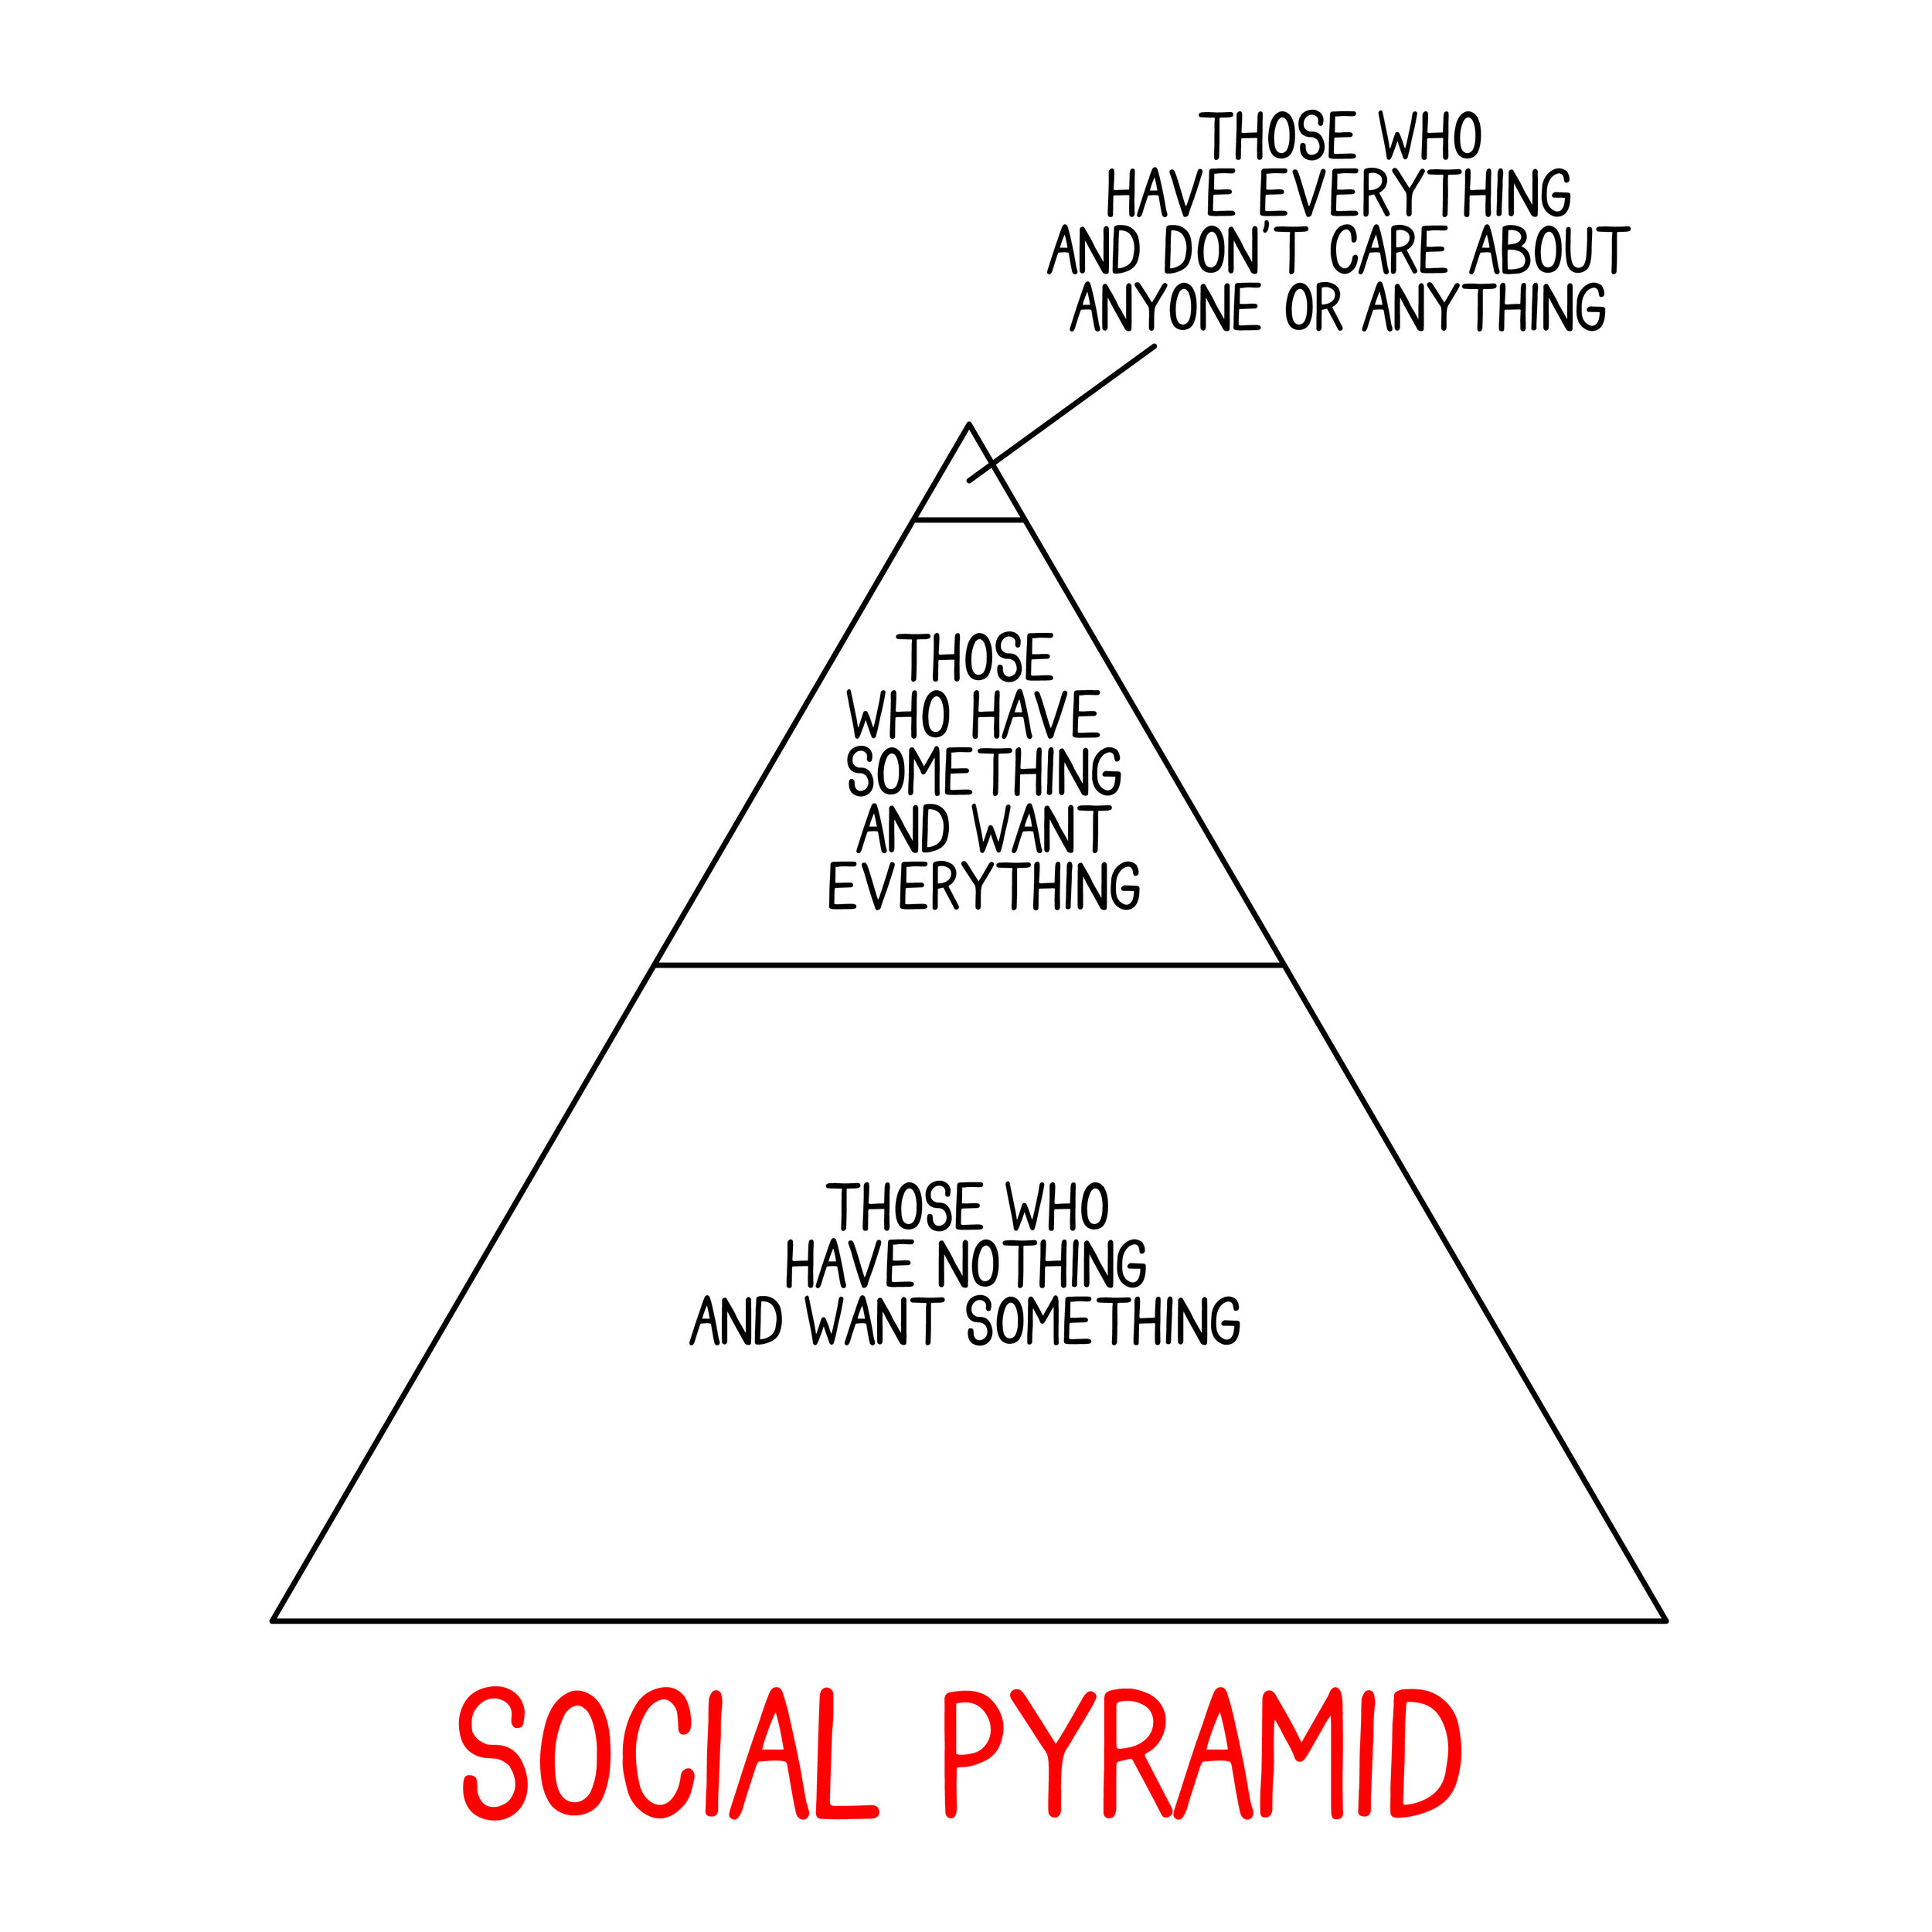 socialpyramid-01.jpg